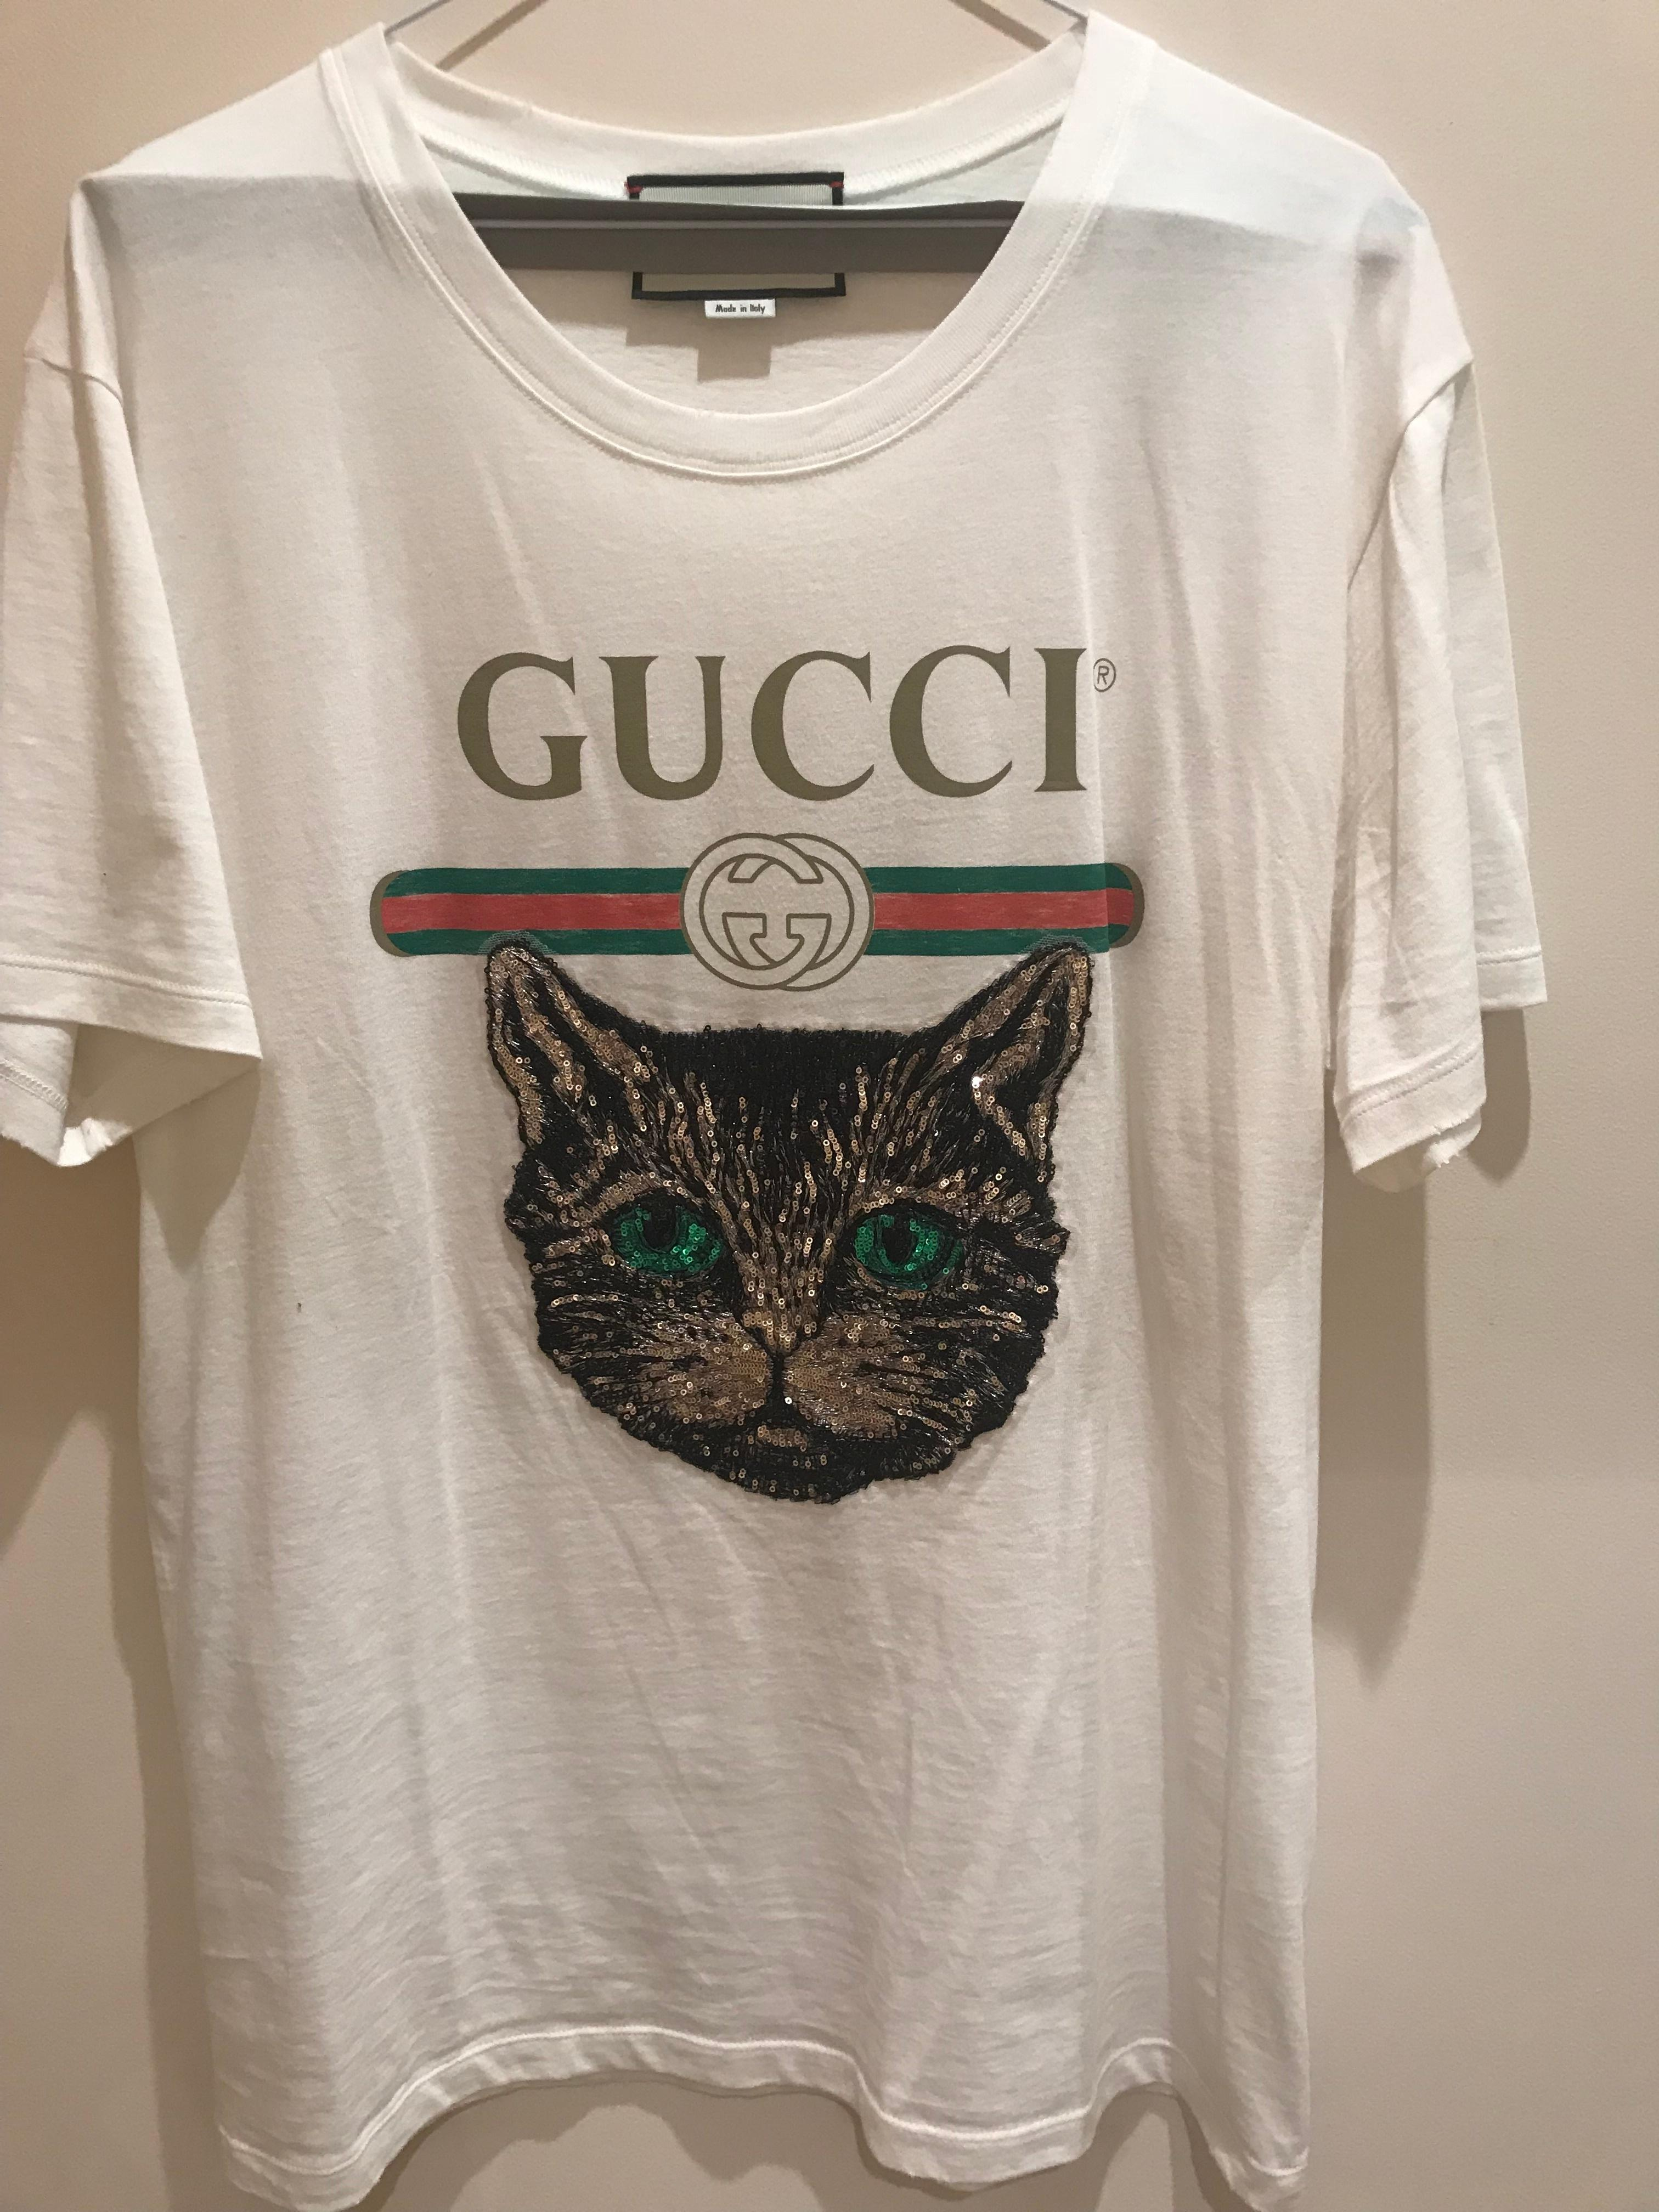 10604ae2 Gucci logo - T-Shirt - Mystic Cat Sequin - Size M (Aus 10-12) | The ...